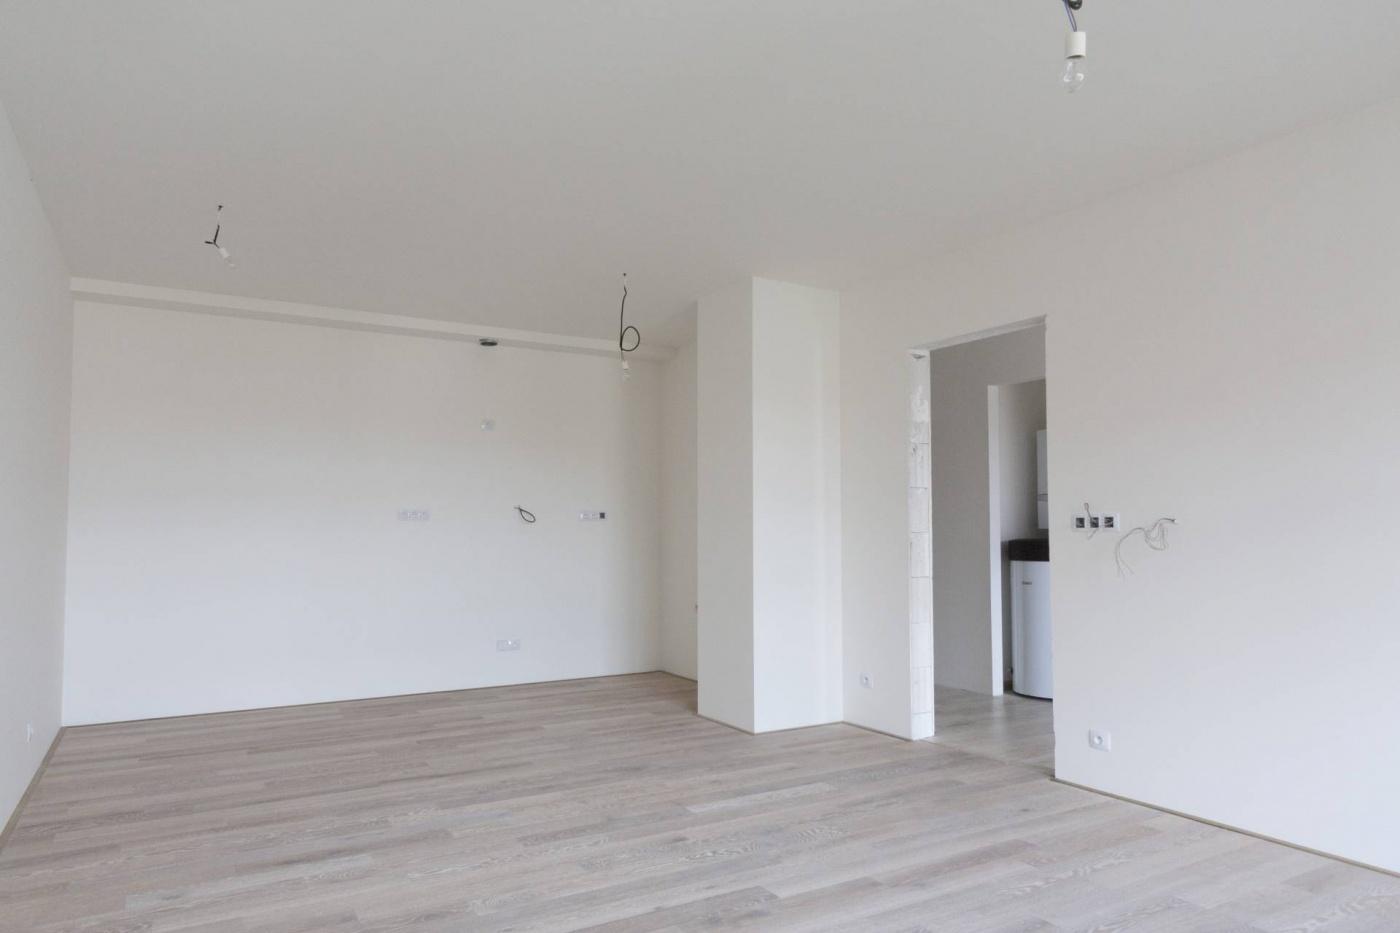 Půdní byt 2+kk, plocha 79 m², ulice Lumírova, Praha 2 - Vyšehrad   3